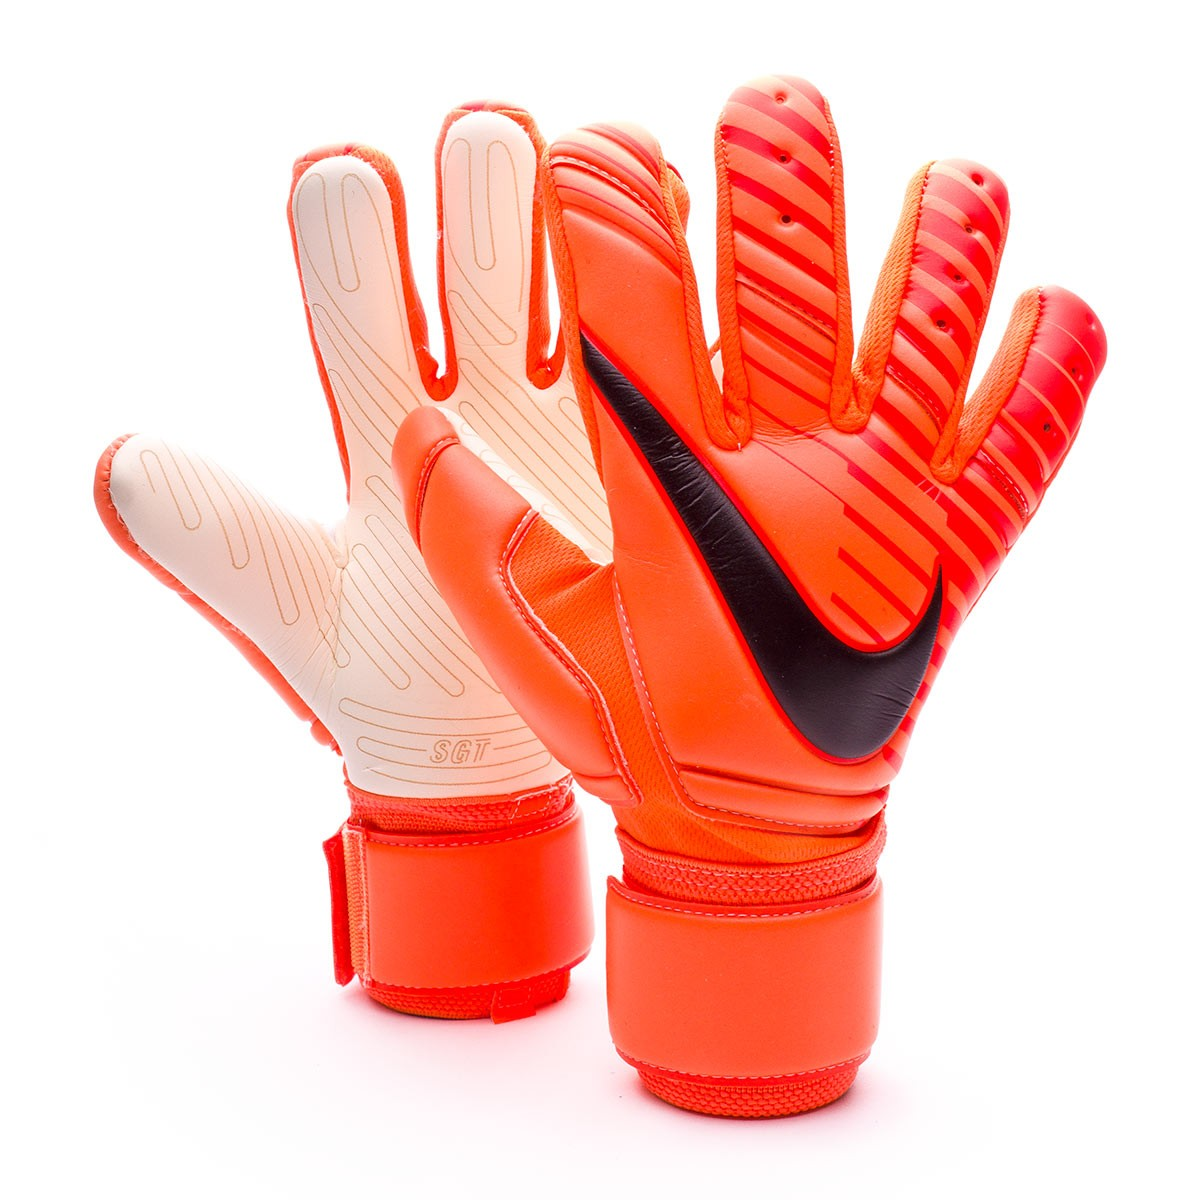 c62a11fa9 Glove Nike Premier SGT Reverse Stitch Promo - Tienda de fútbol ...